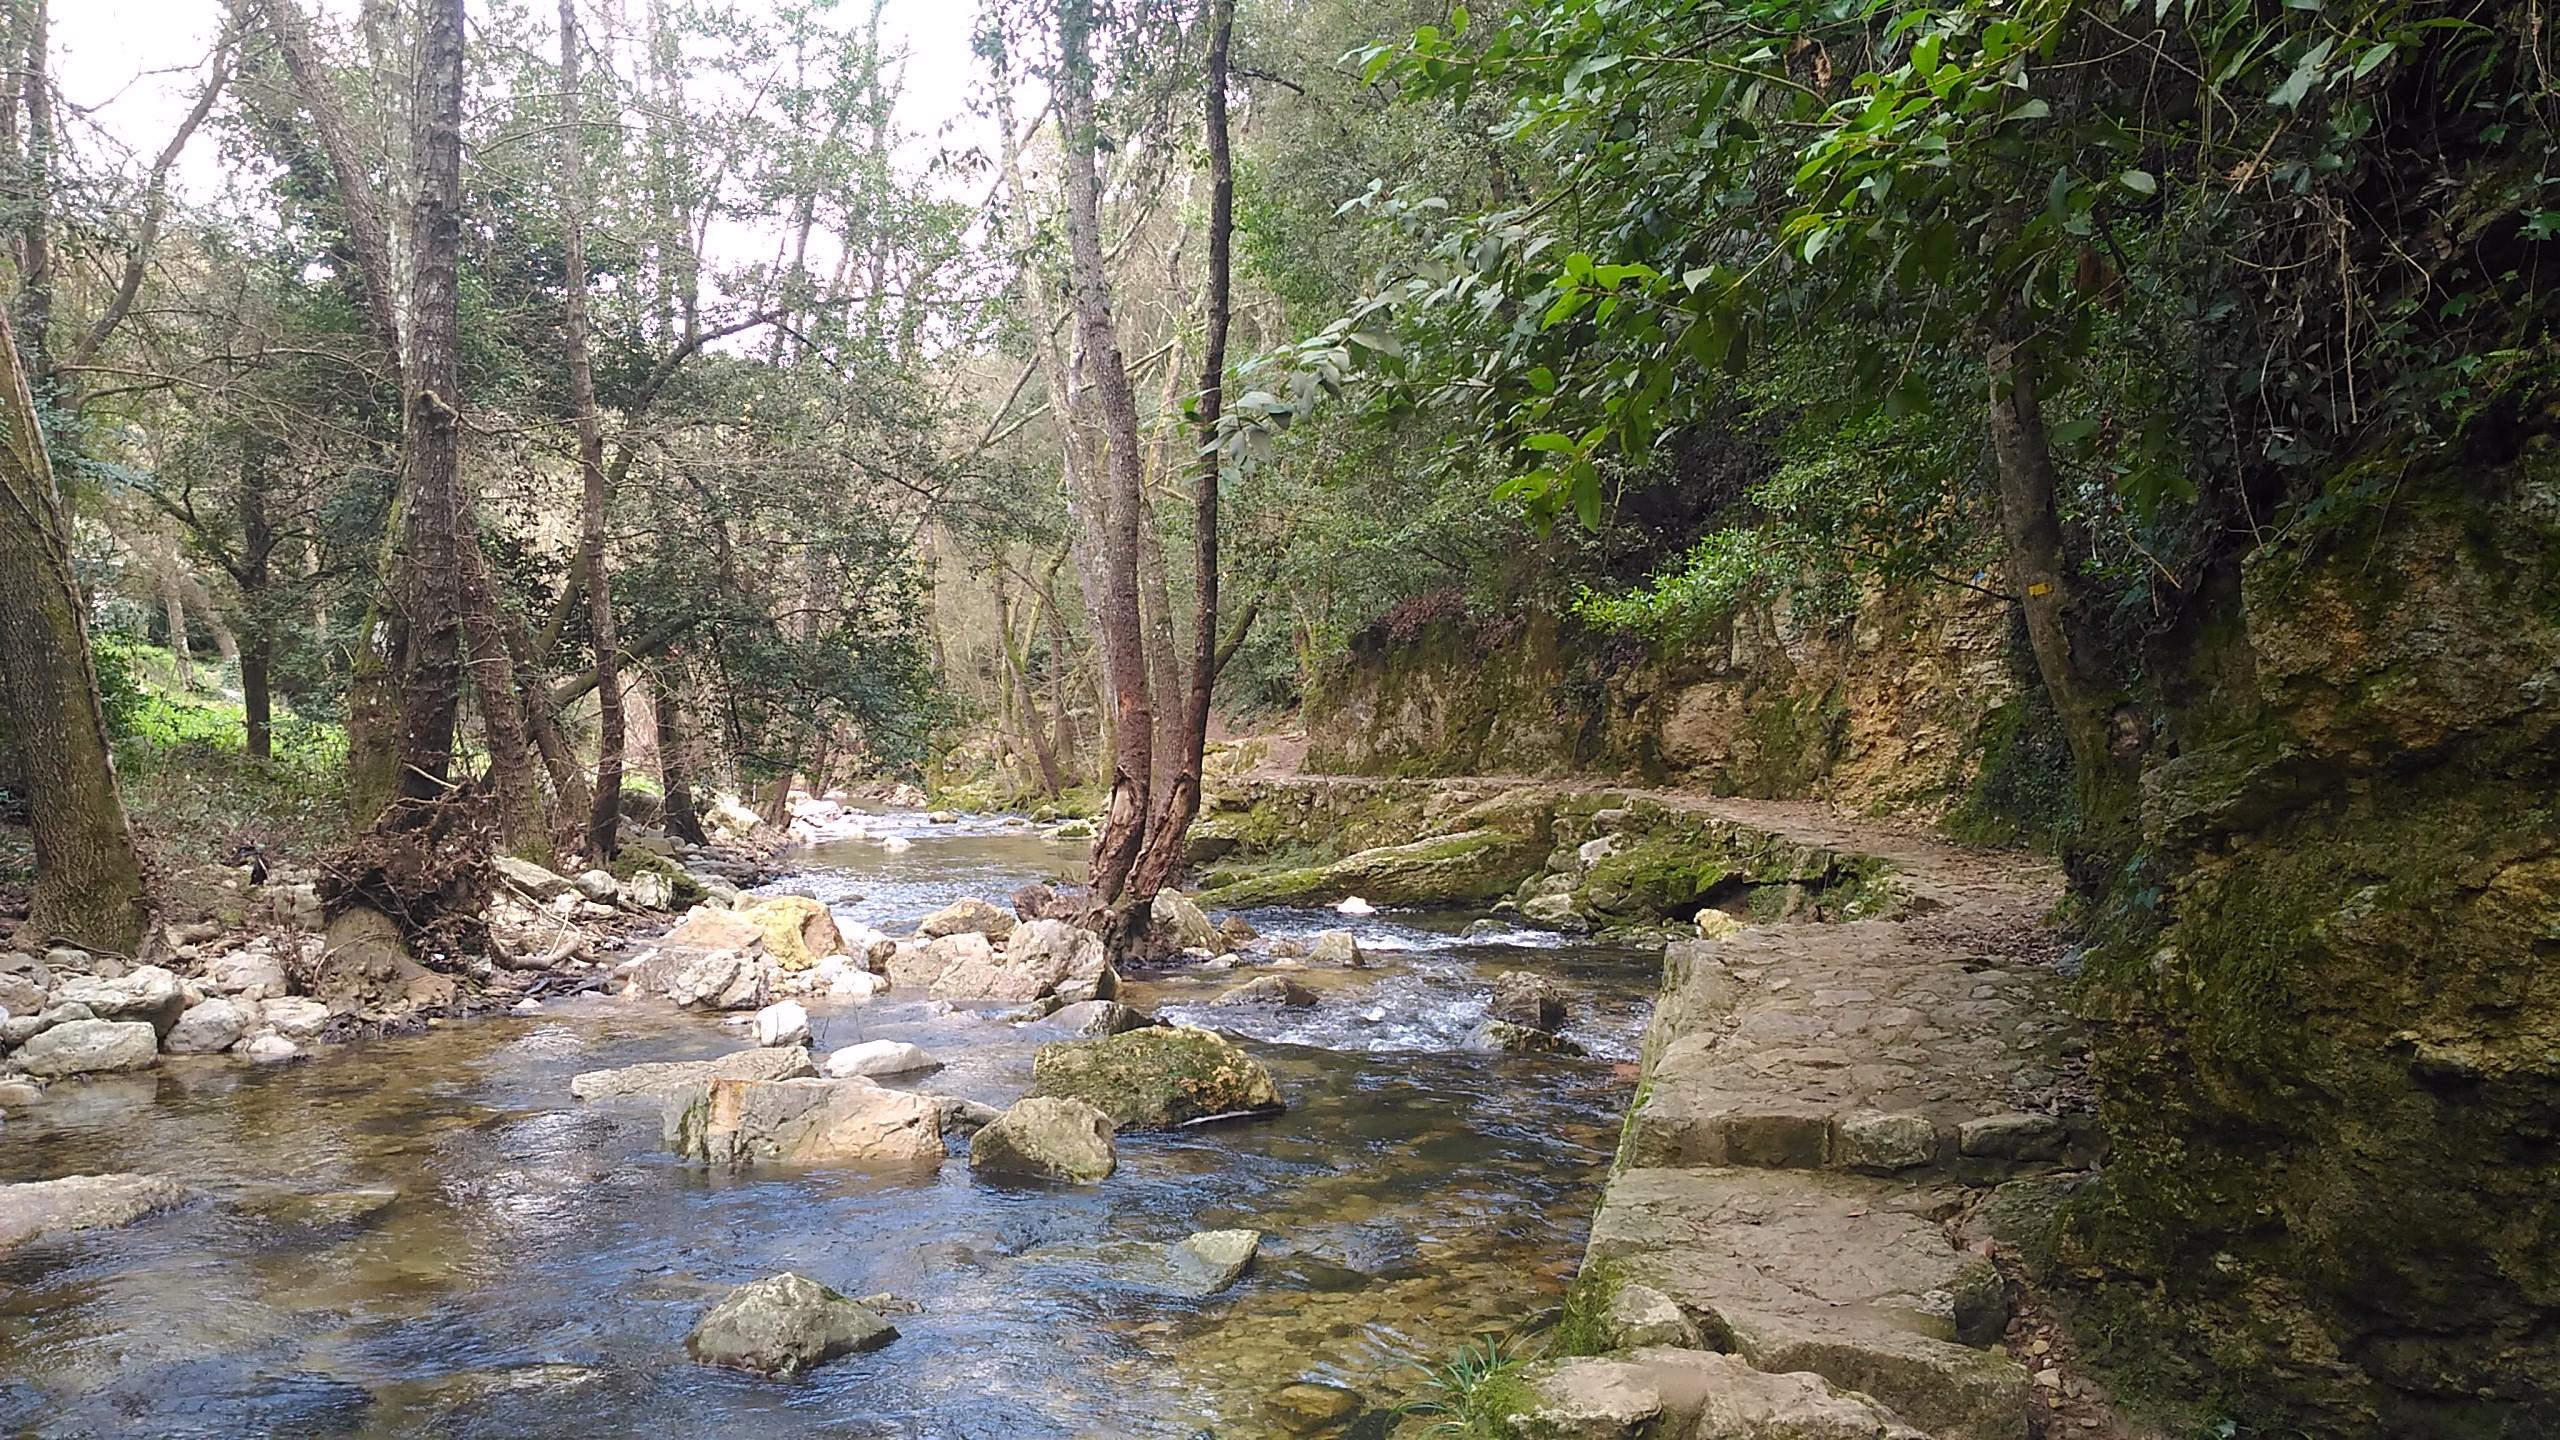 balade   pont des tamarins  u00e0 biot vers valbonne par la